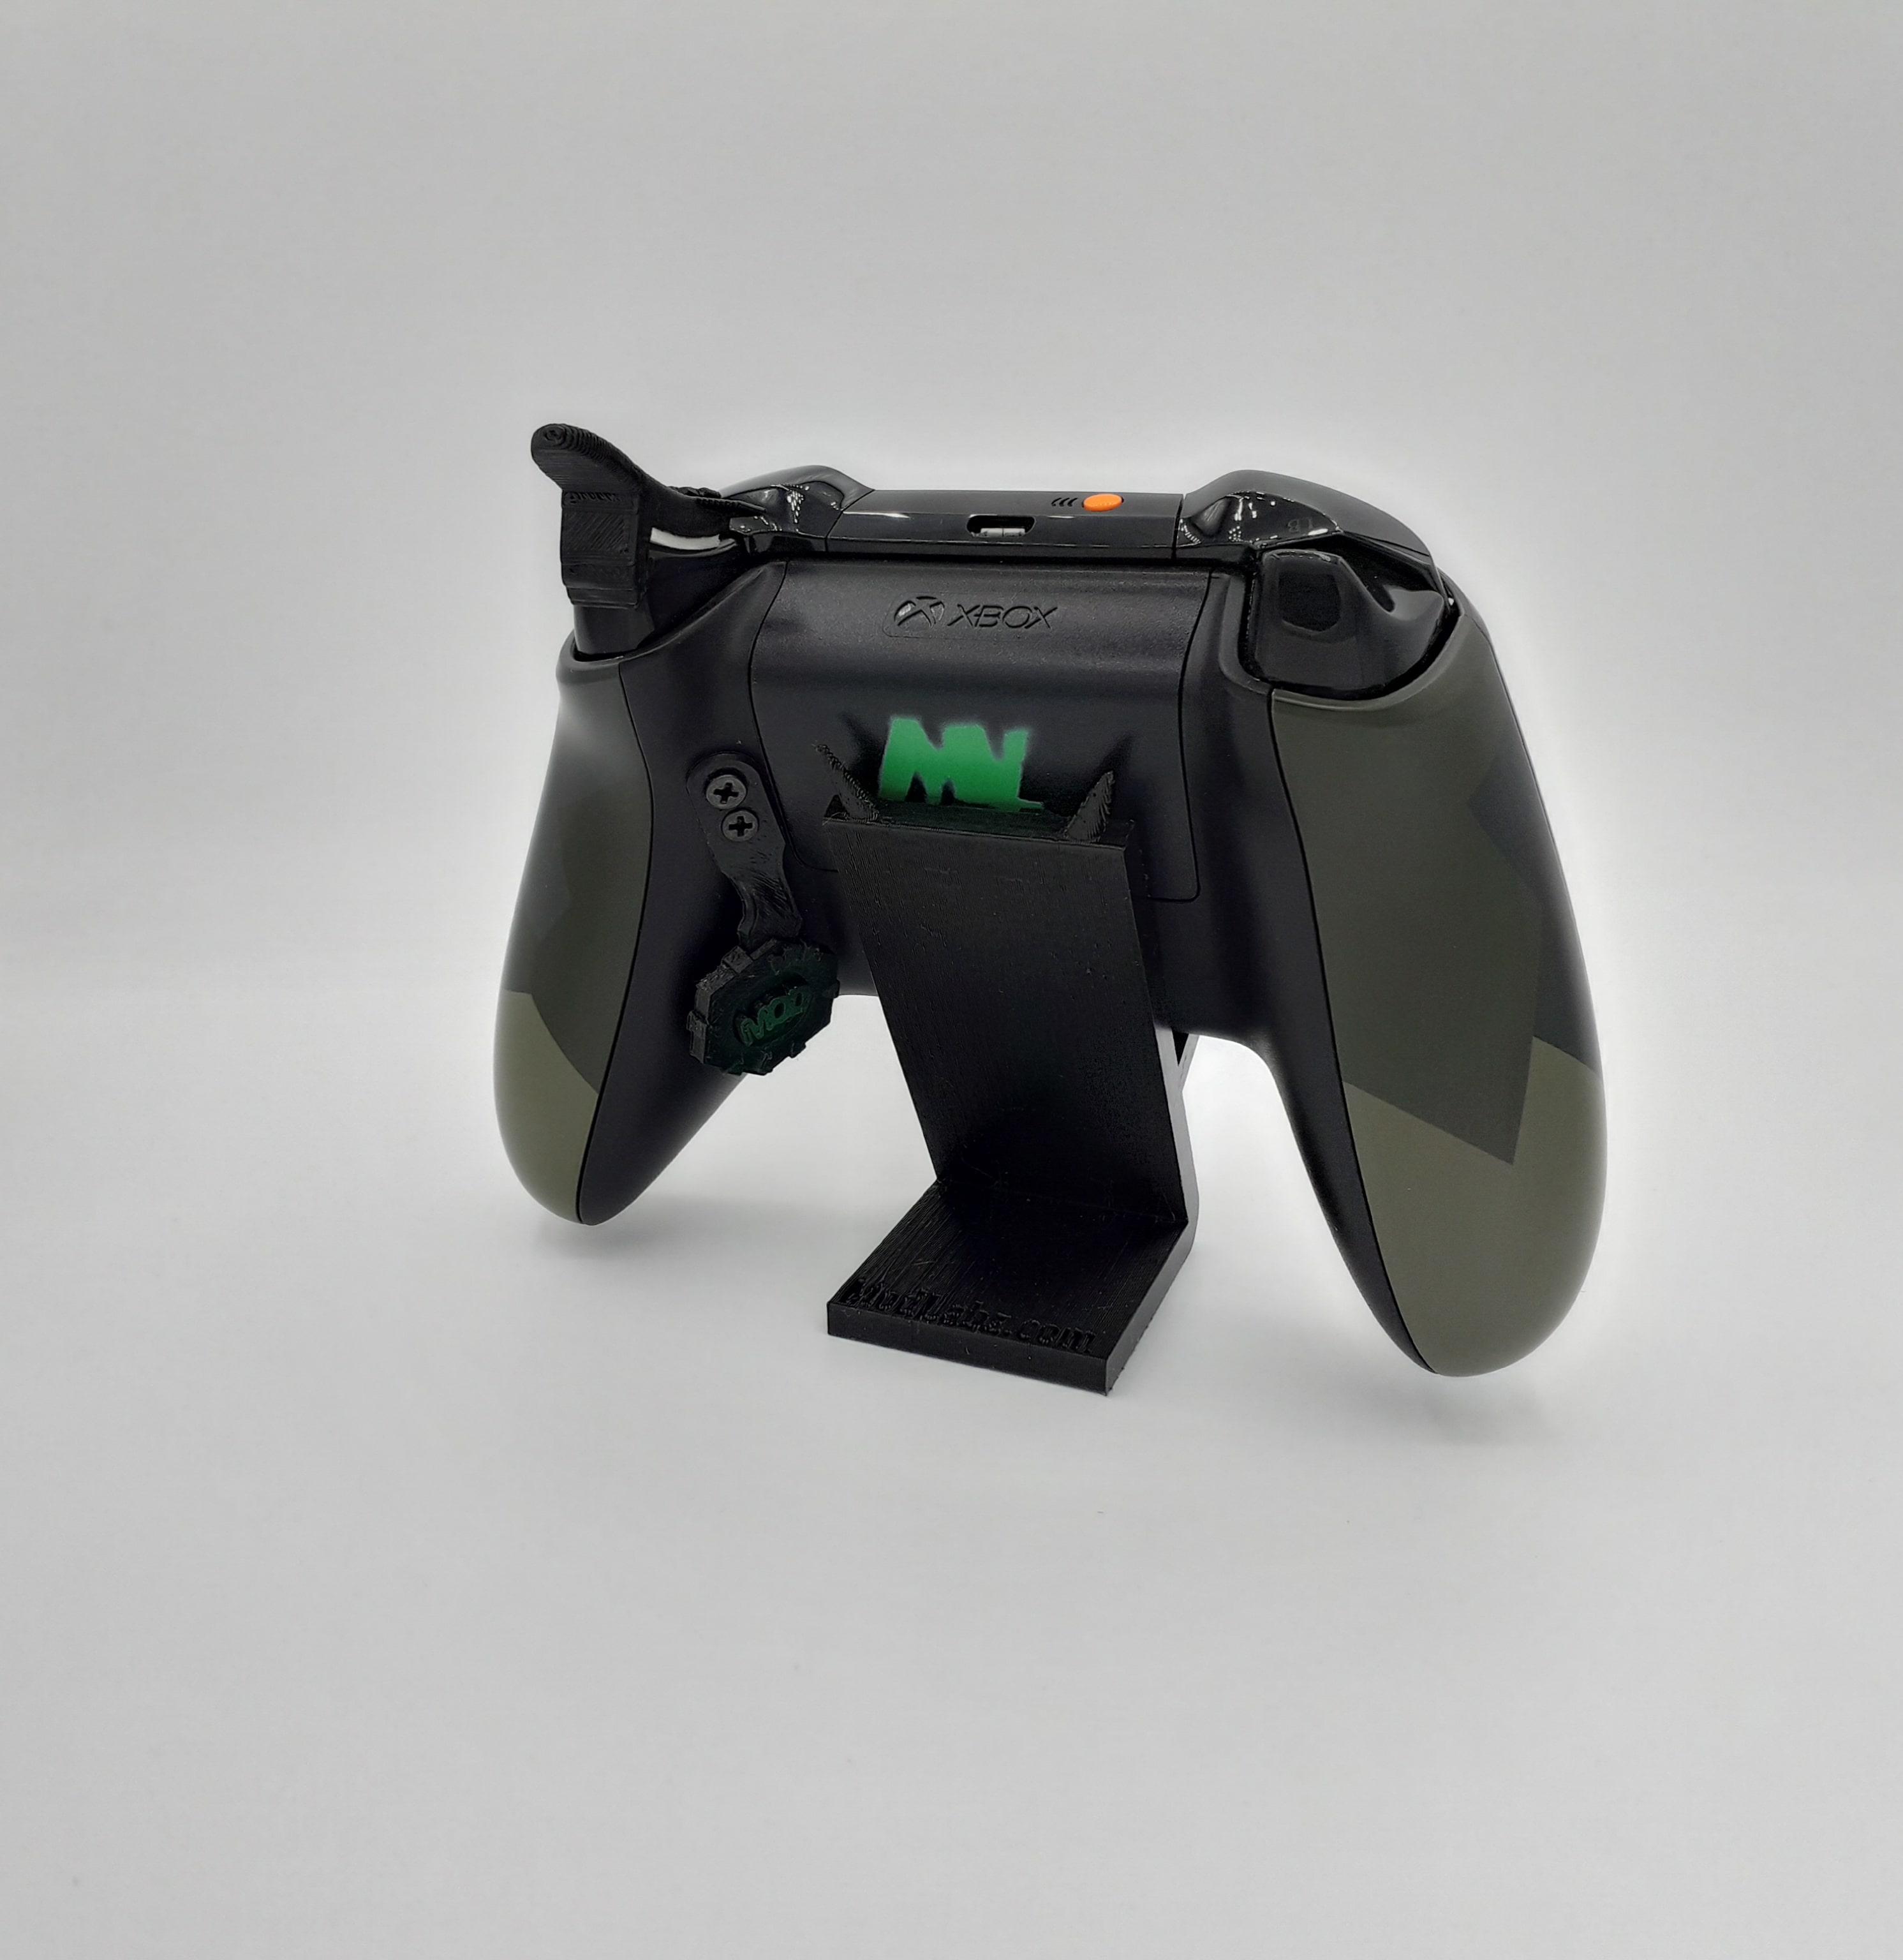 ModLabz Xbox One S Controller Max Power Rapid Fire Mod